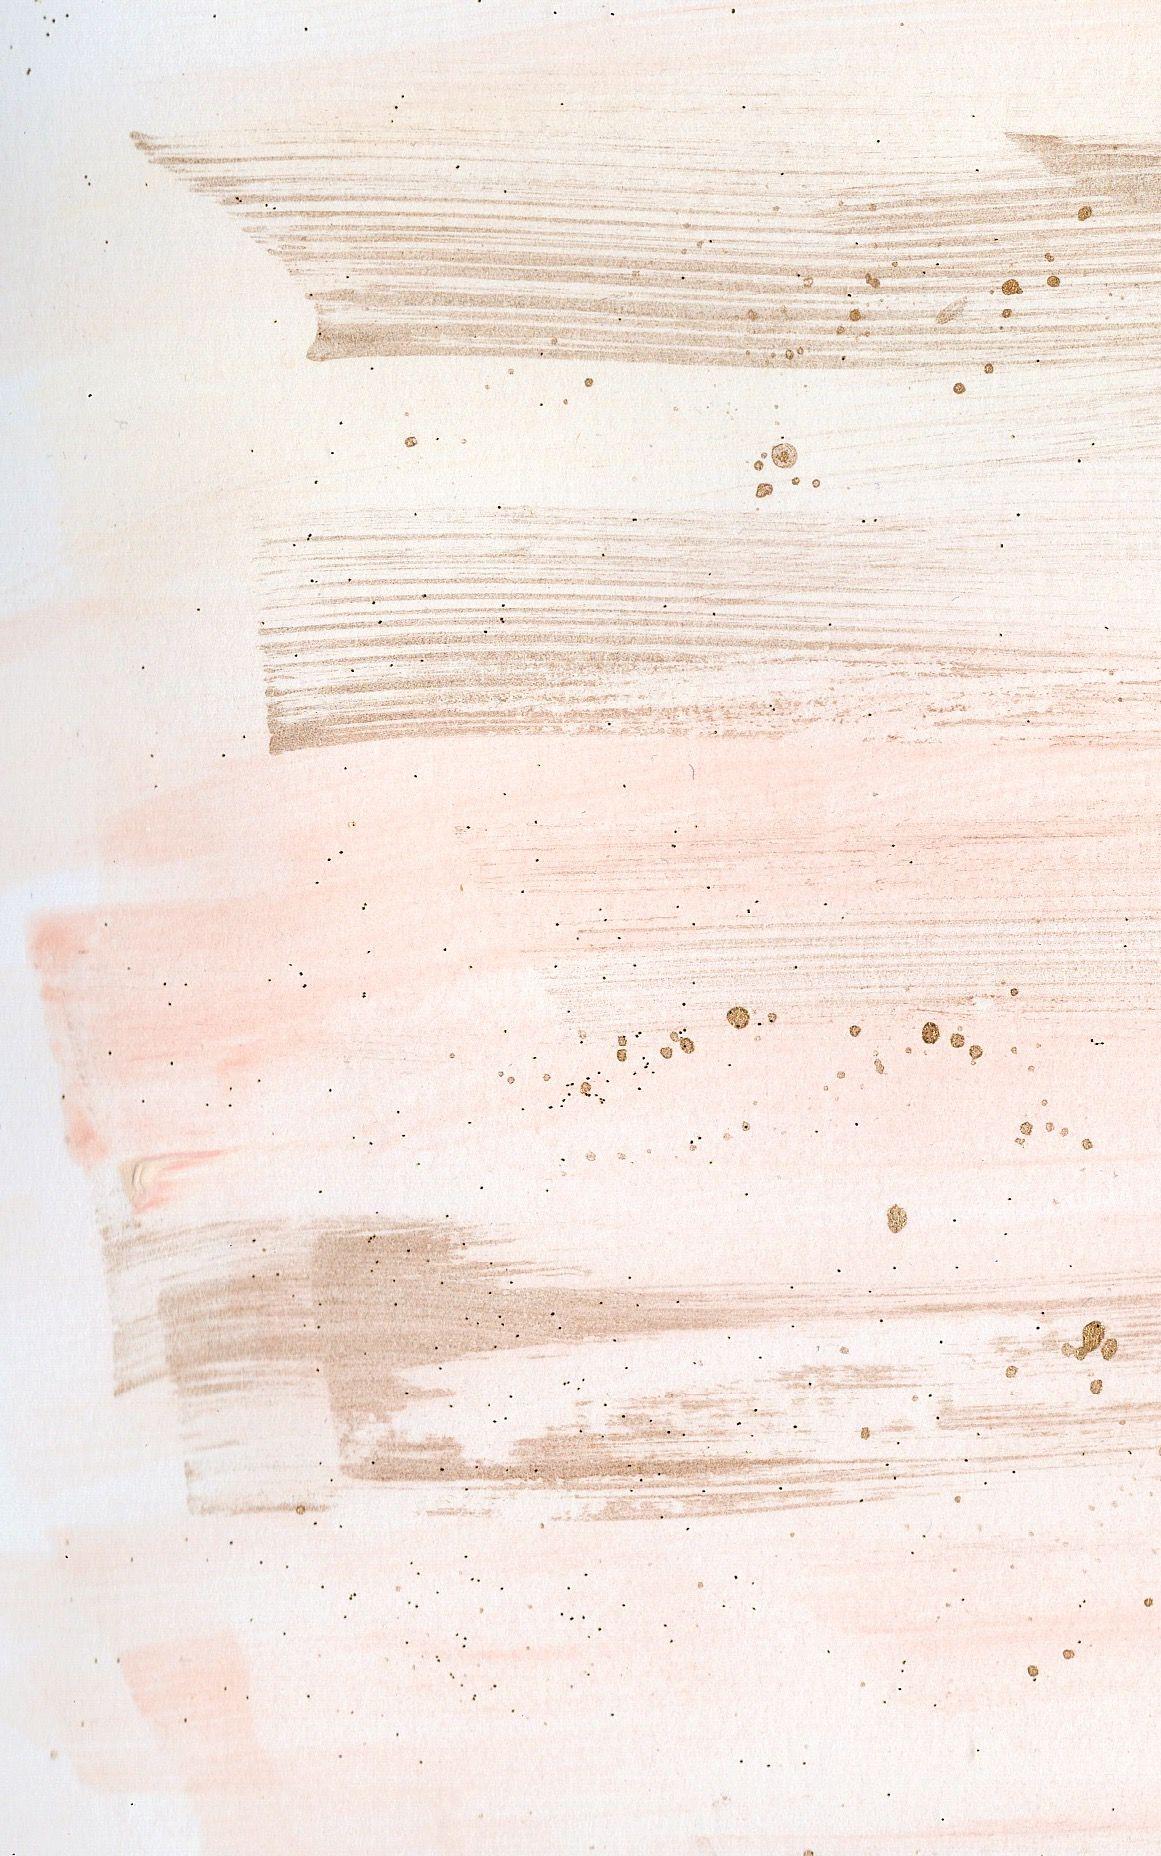 Subtle Neutral Taupe Sand Light Pink Raspberry Ice In 2021 Instagram Wallpaper Instagram Background Ipad Background